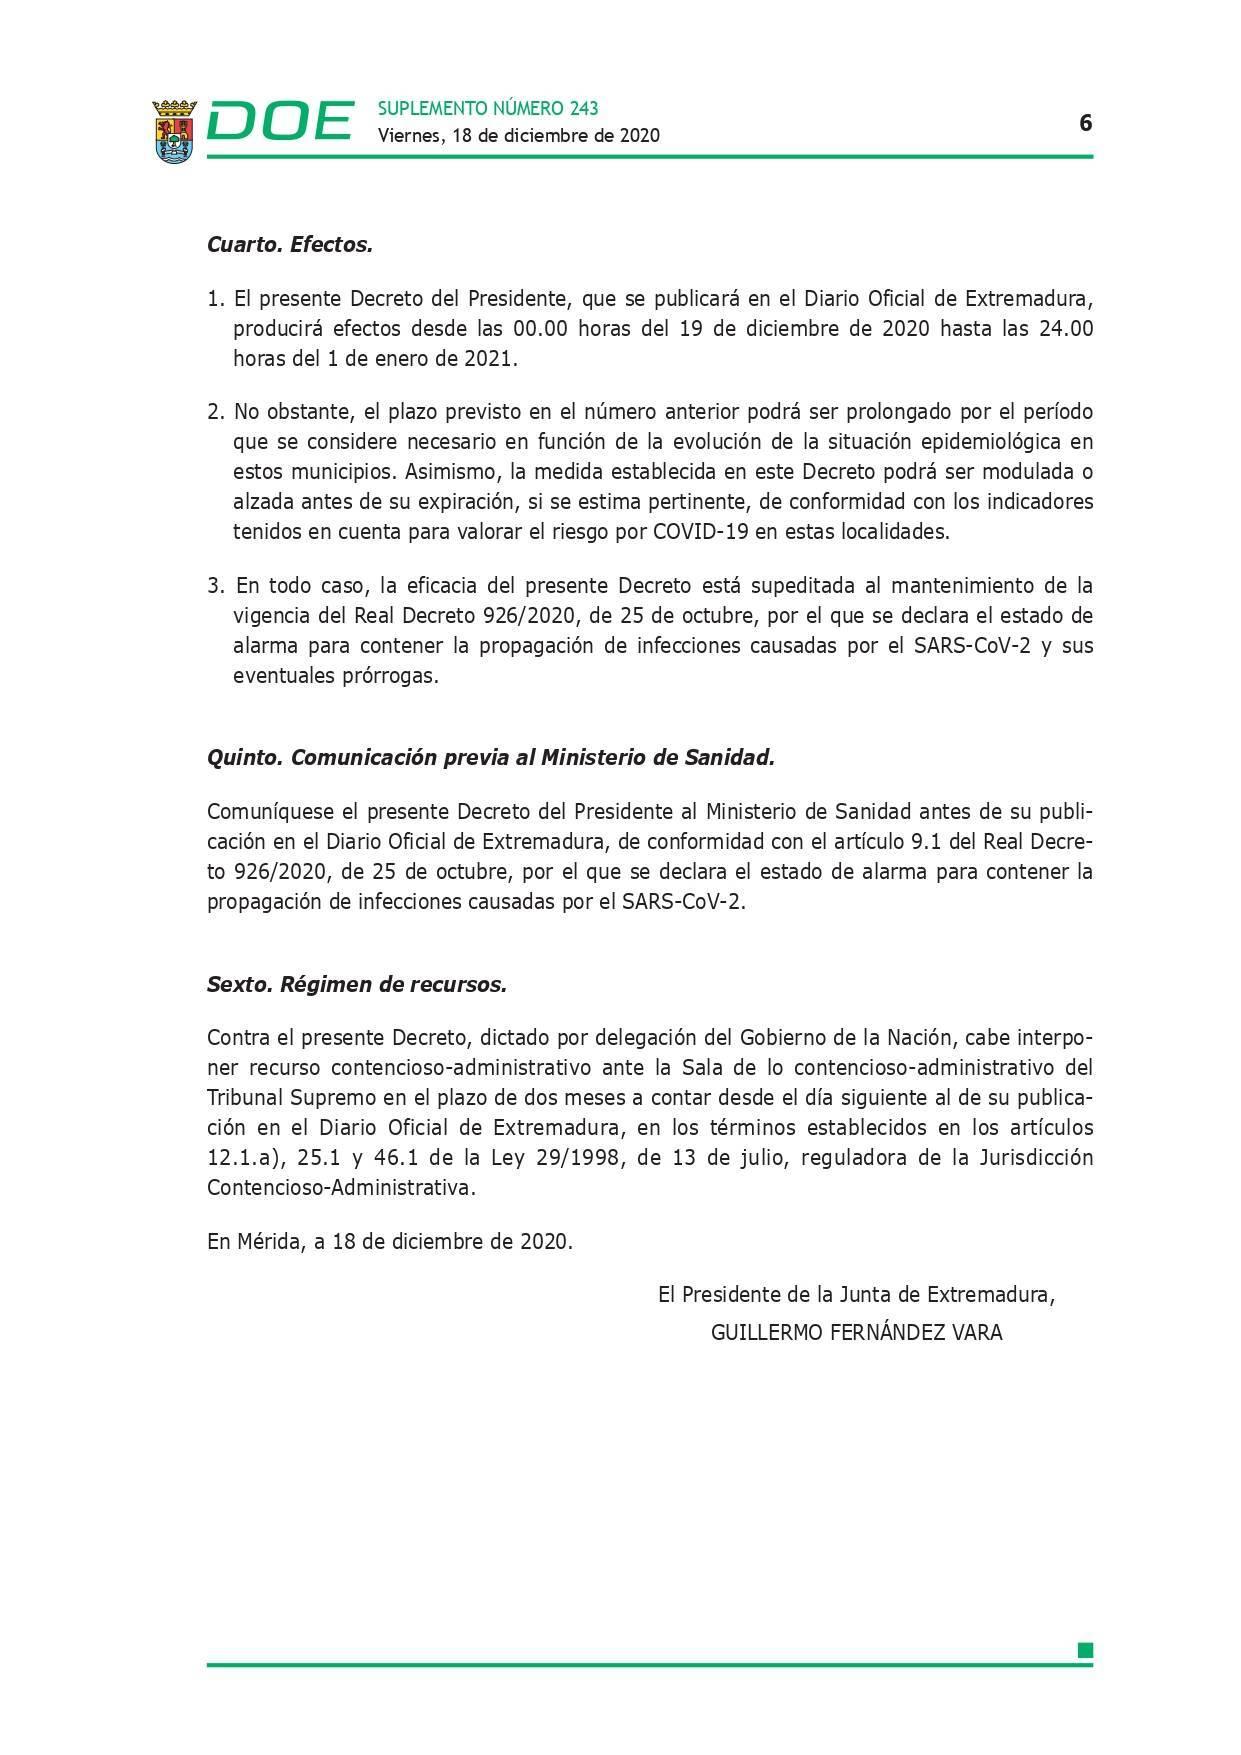 Cierre perimetral por COVID-19 (2020) - Talayuela (Cáceres), Logrosán (Cáceres) y Cañamero (Cáceres) 6